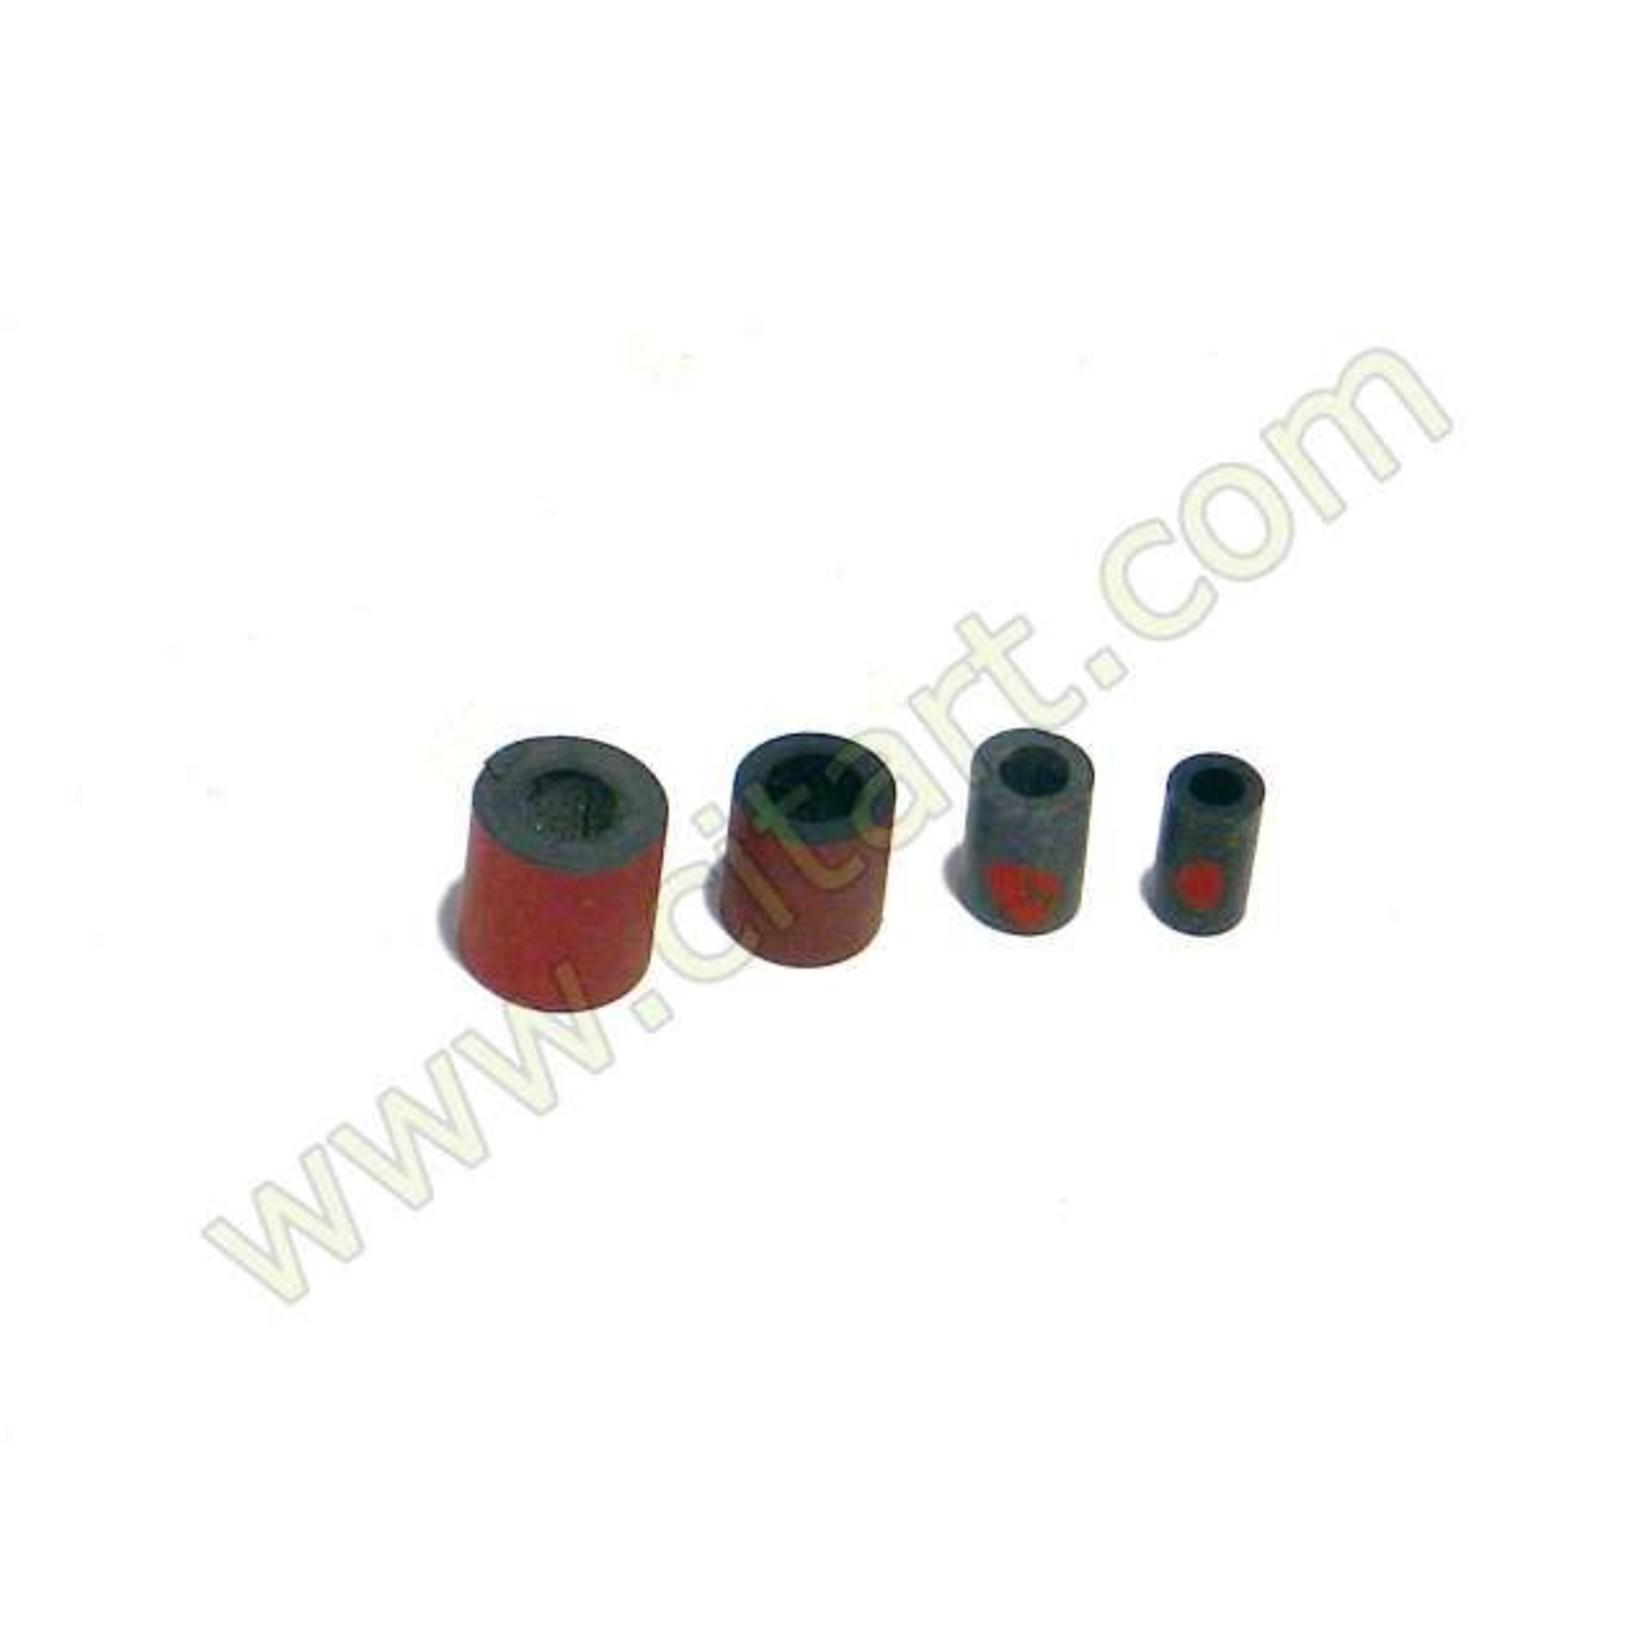 Rubber joint brake accumulator LHS Nr Org: 1586S